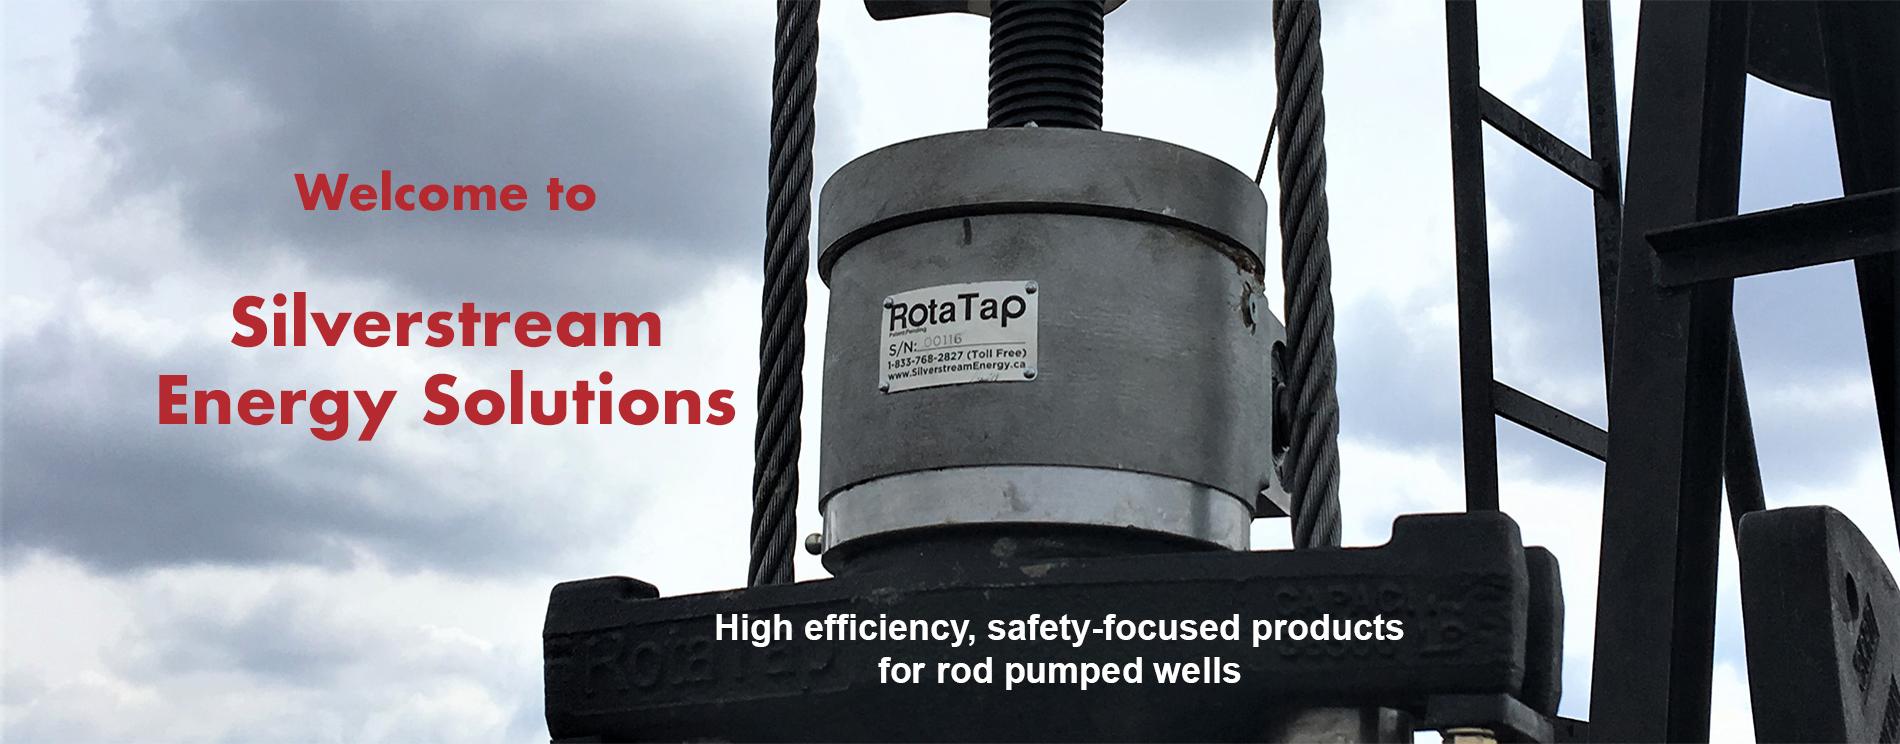 Silverstream Energy Solutions RotaTap image